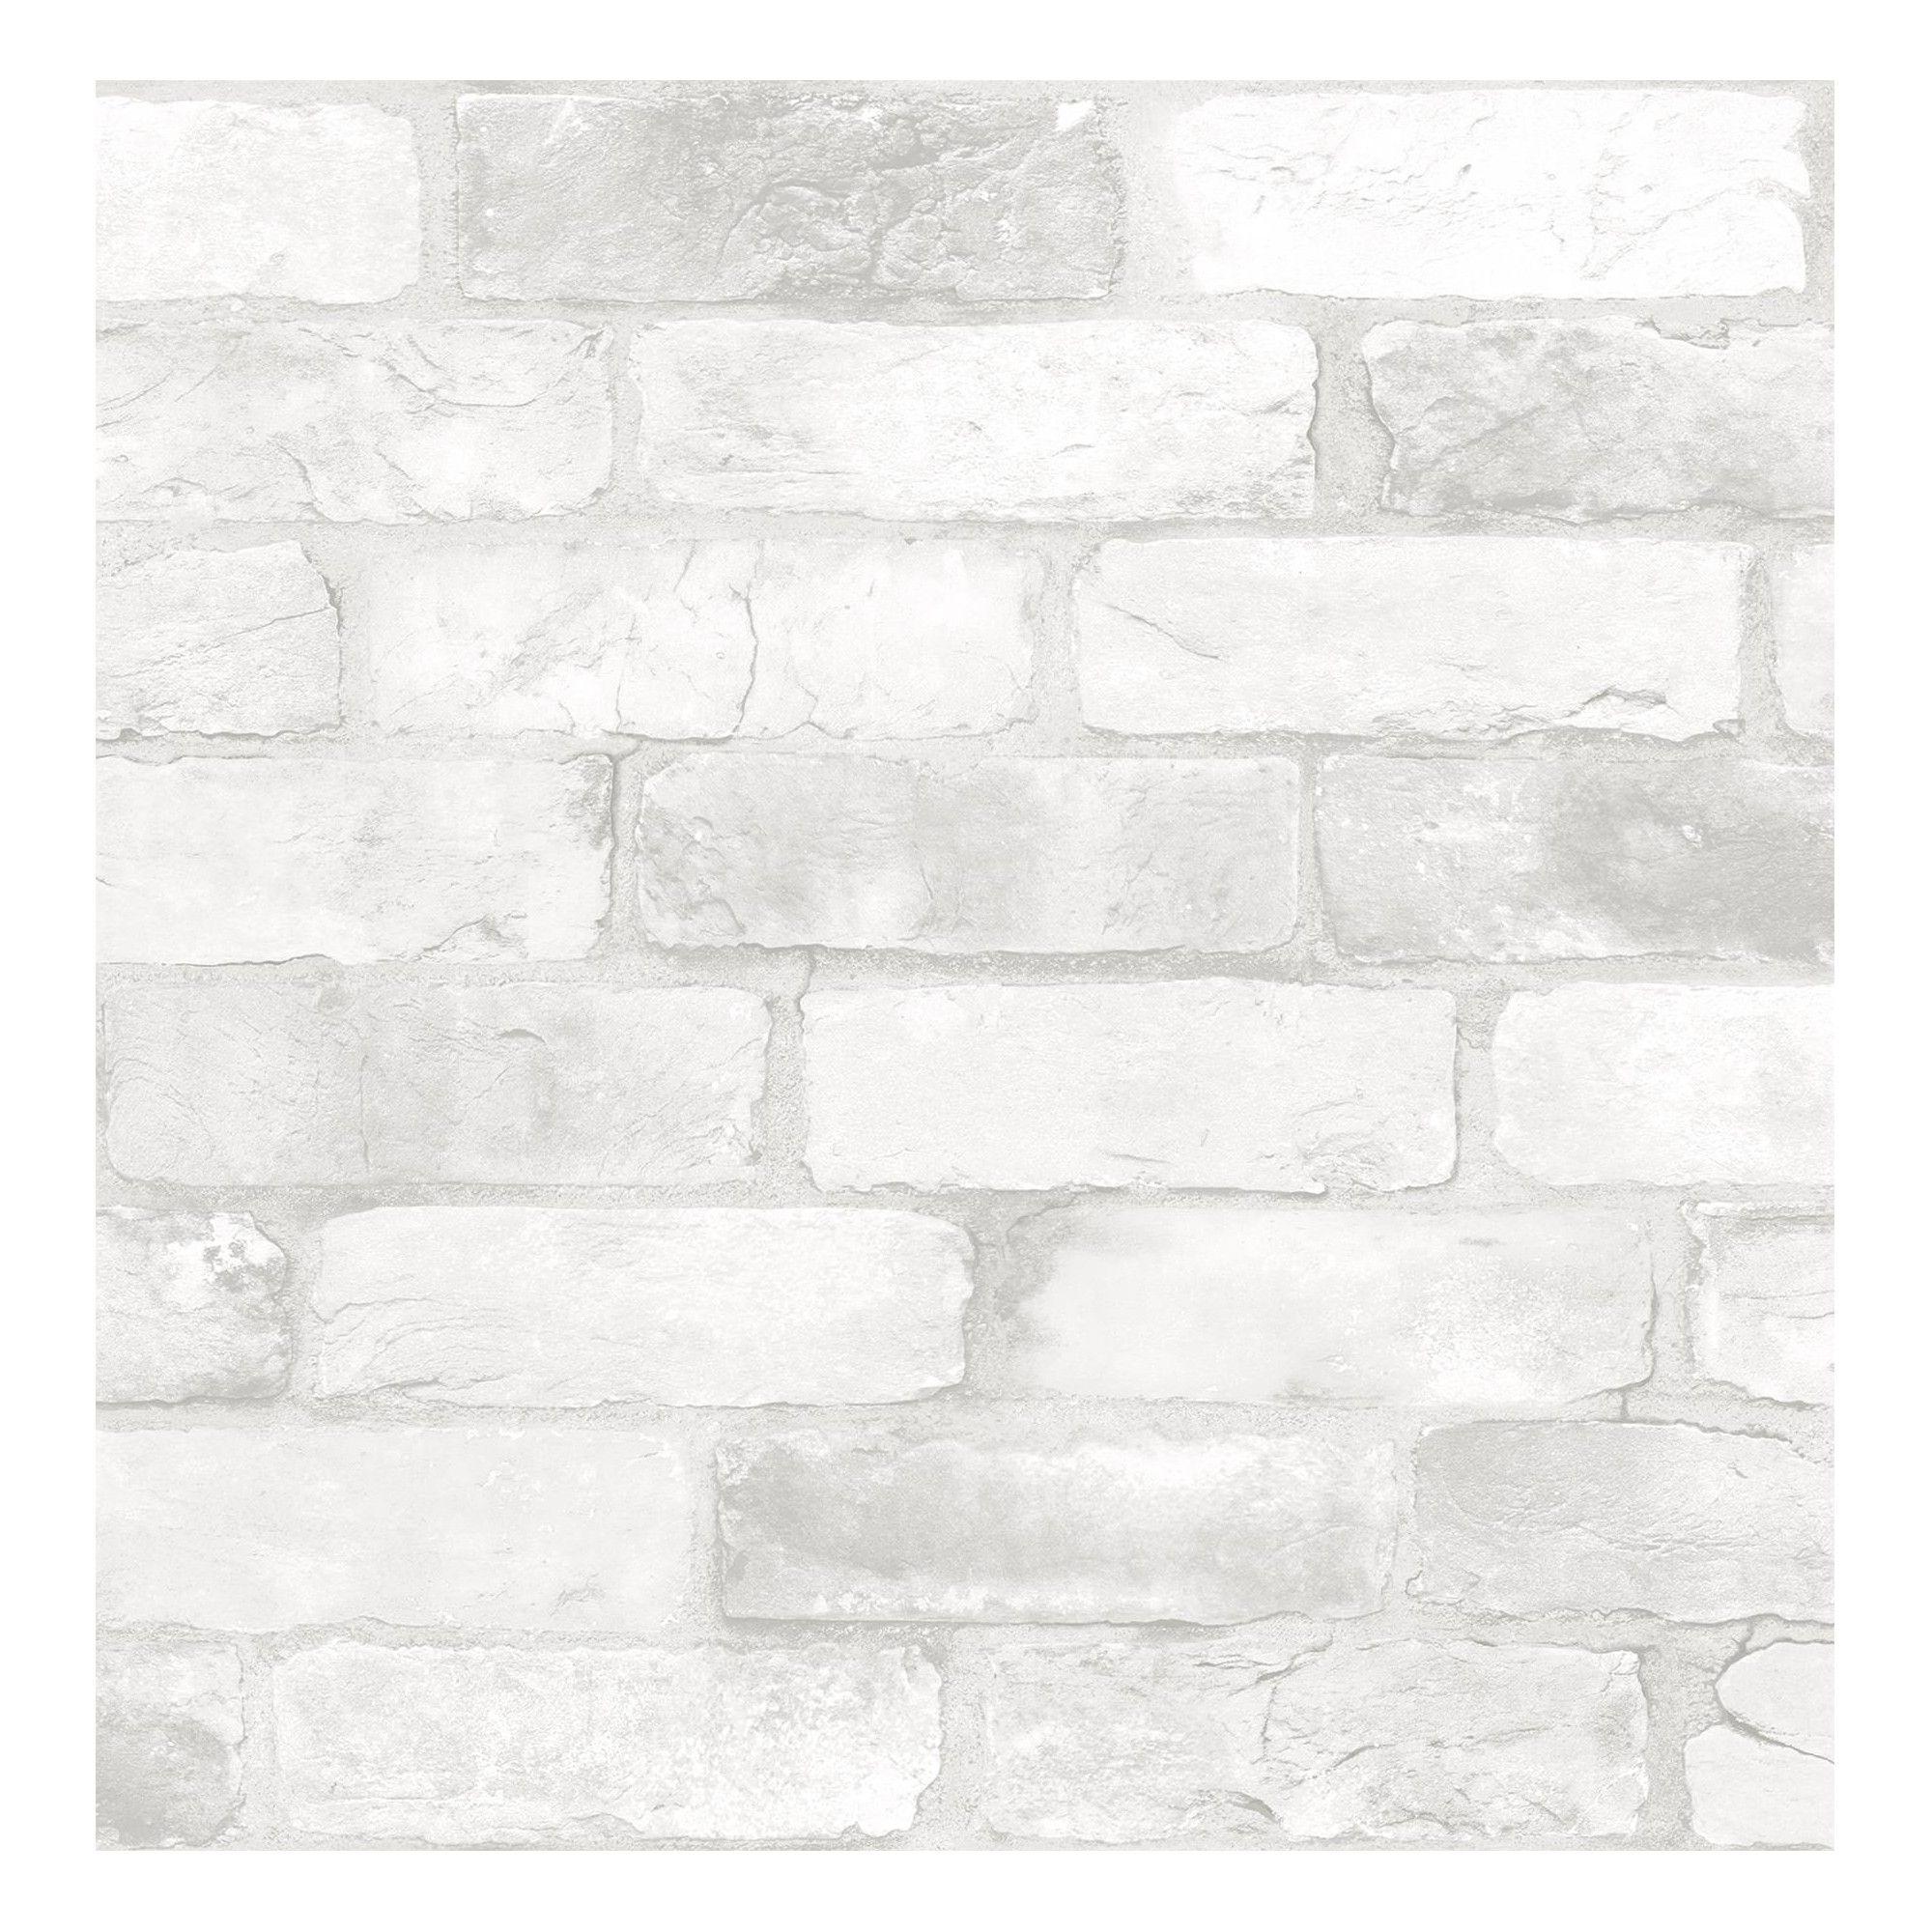 Brewster Loft Brick Peel Stick Wallpaper White White Brick Wallpaper Brick Wallpaper Roll Rustic Wallpaper